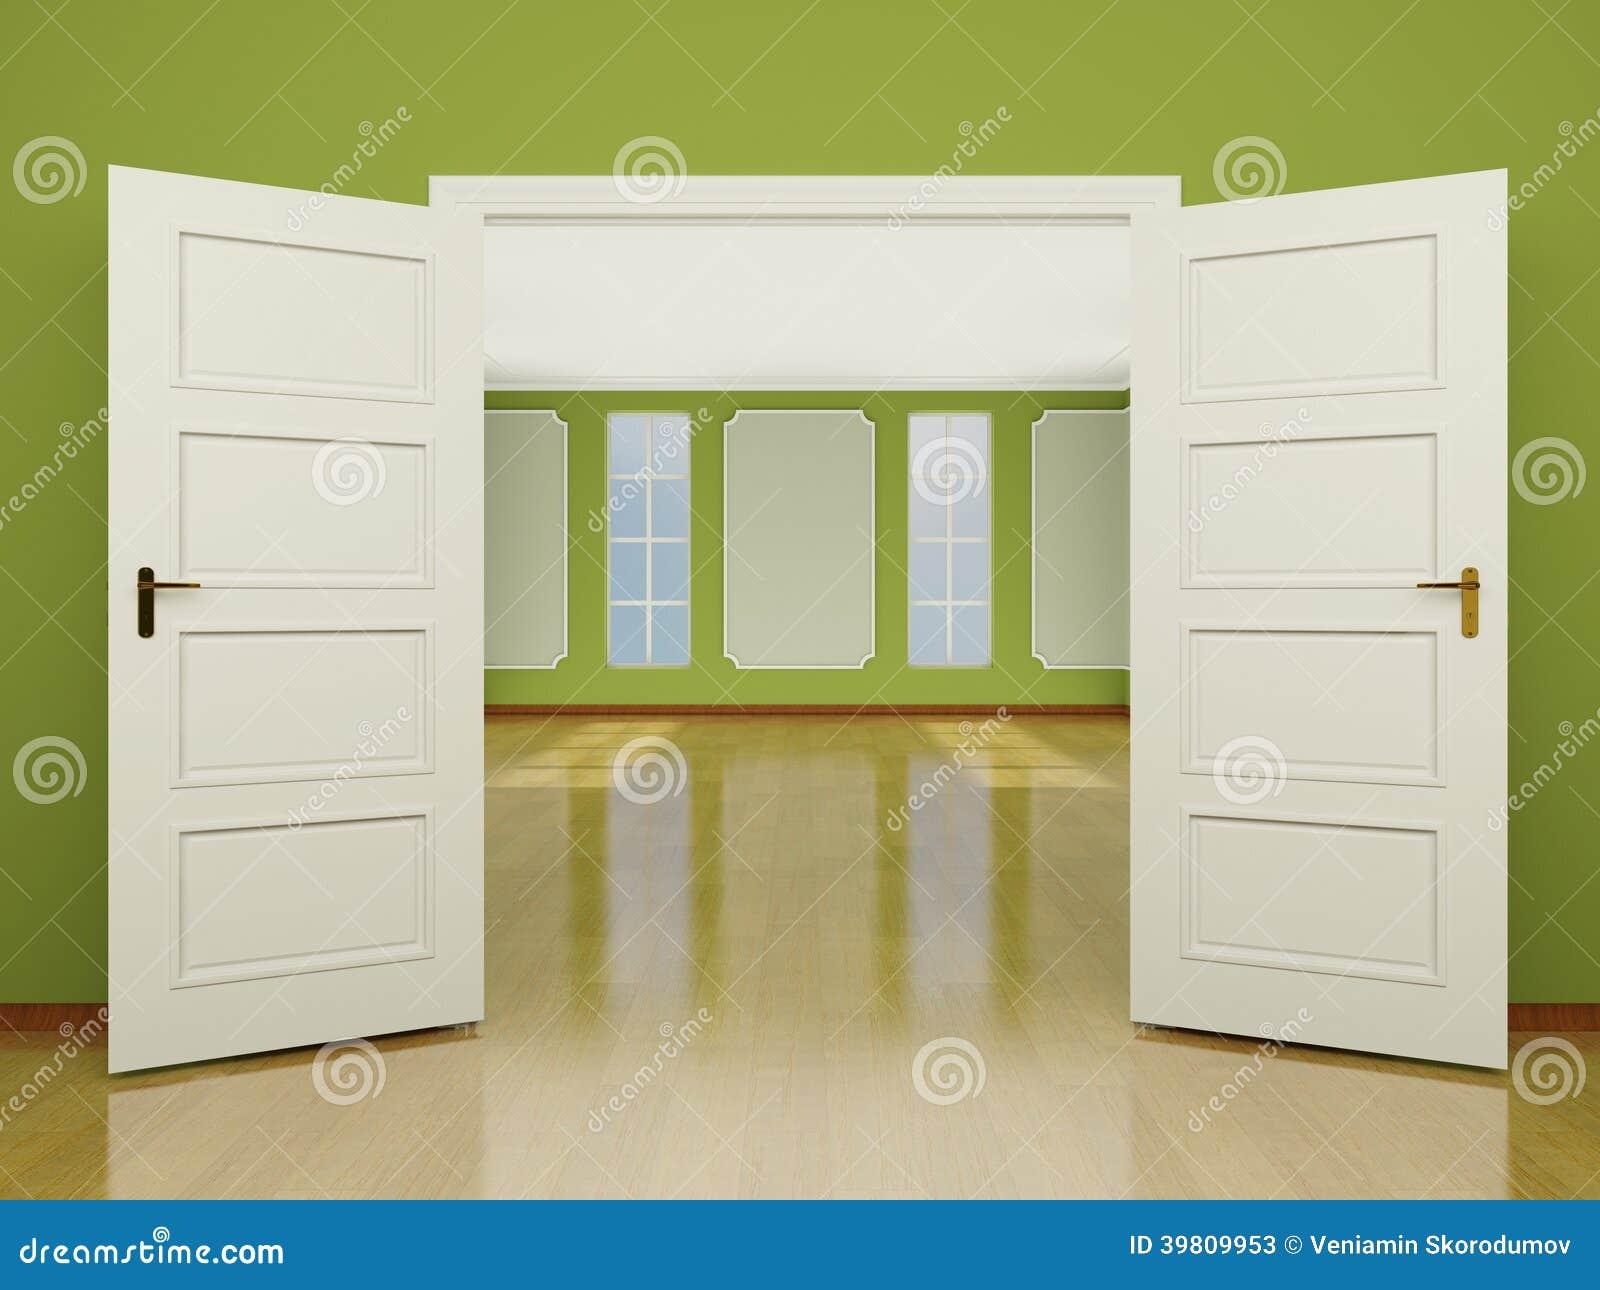 una entrada abierta de par en par de la puerta a la sala